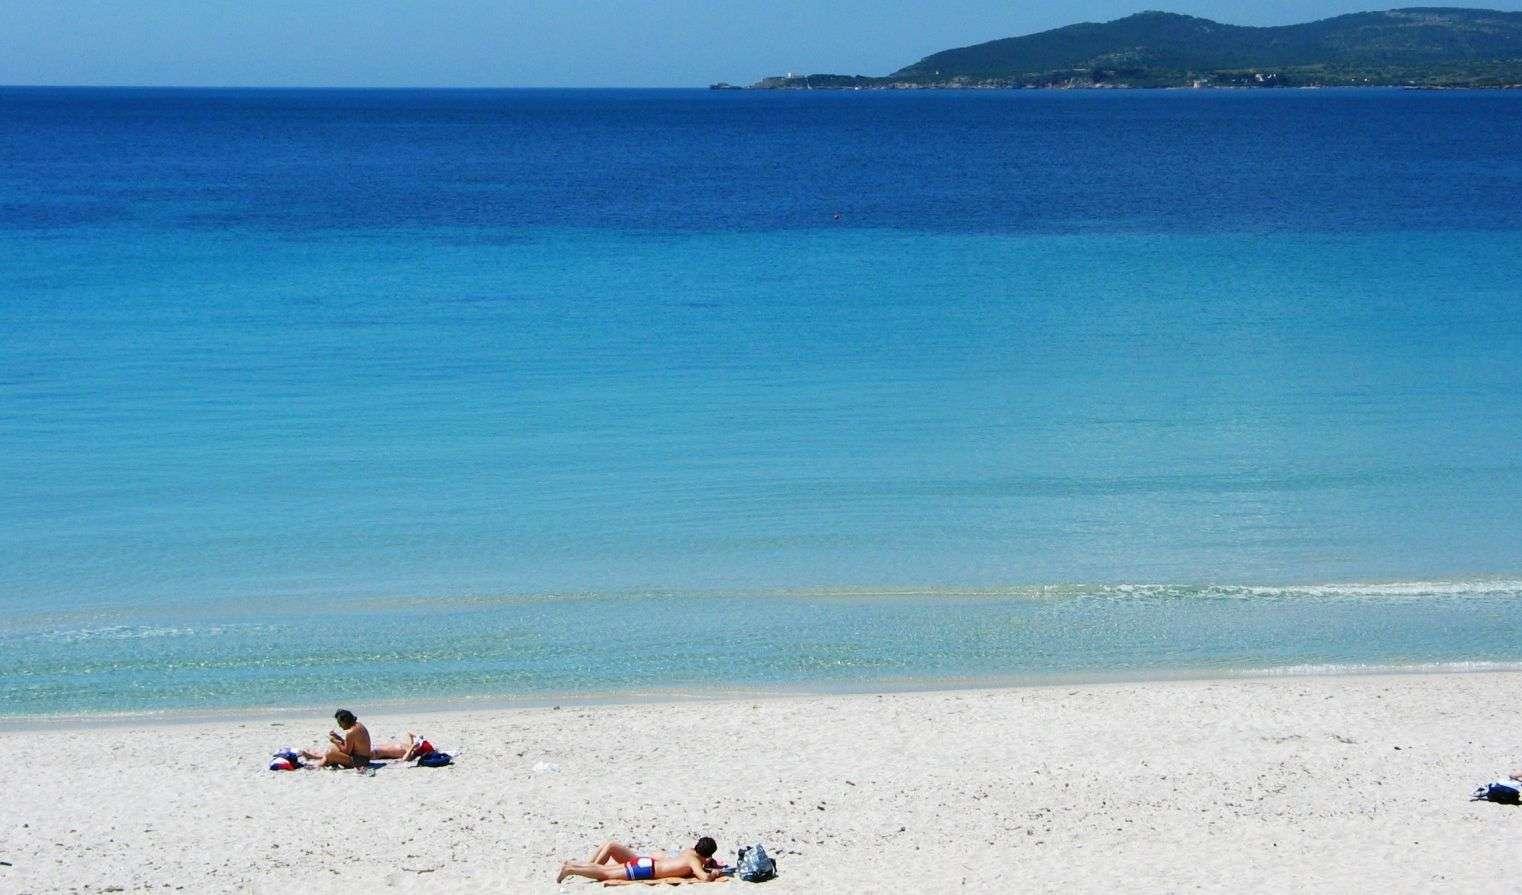 The wonderful beach Maria Pia